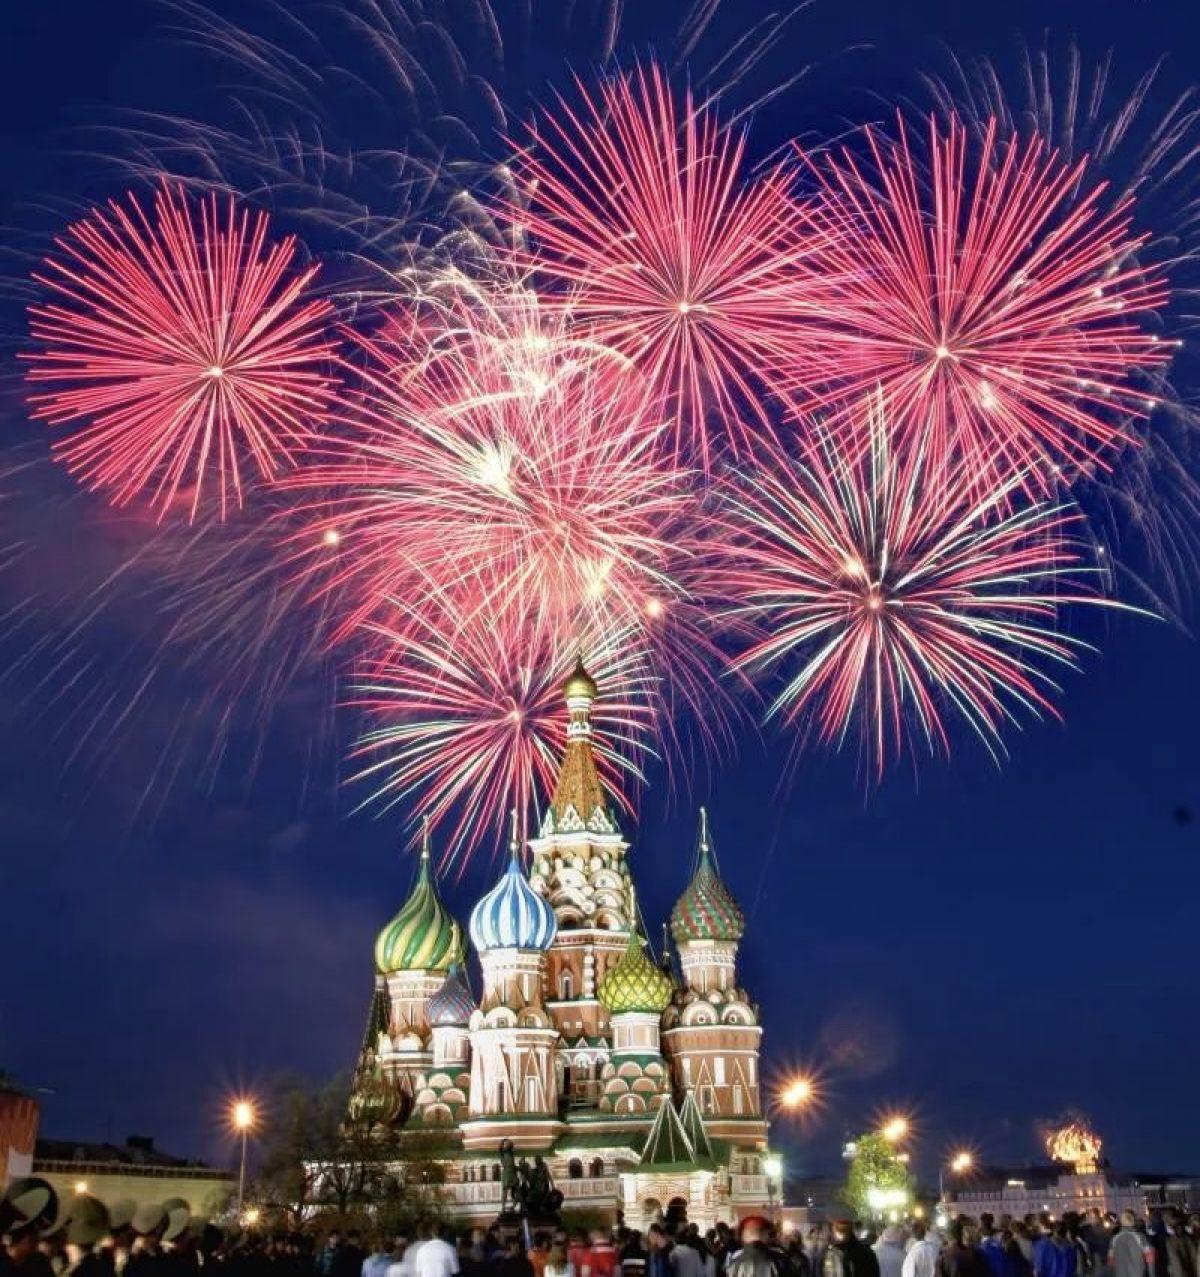 Букетом, картинки праздничный салют на 9 мая